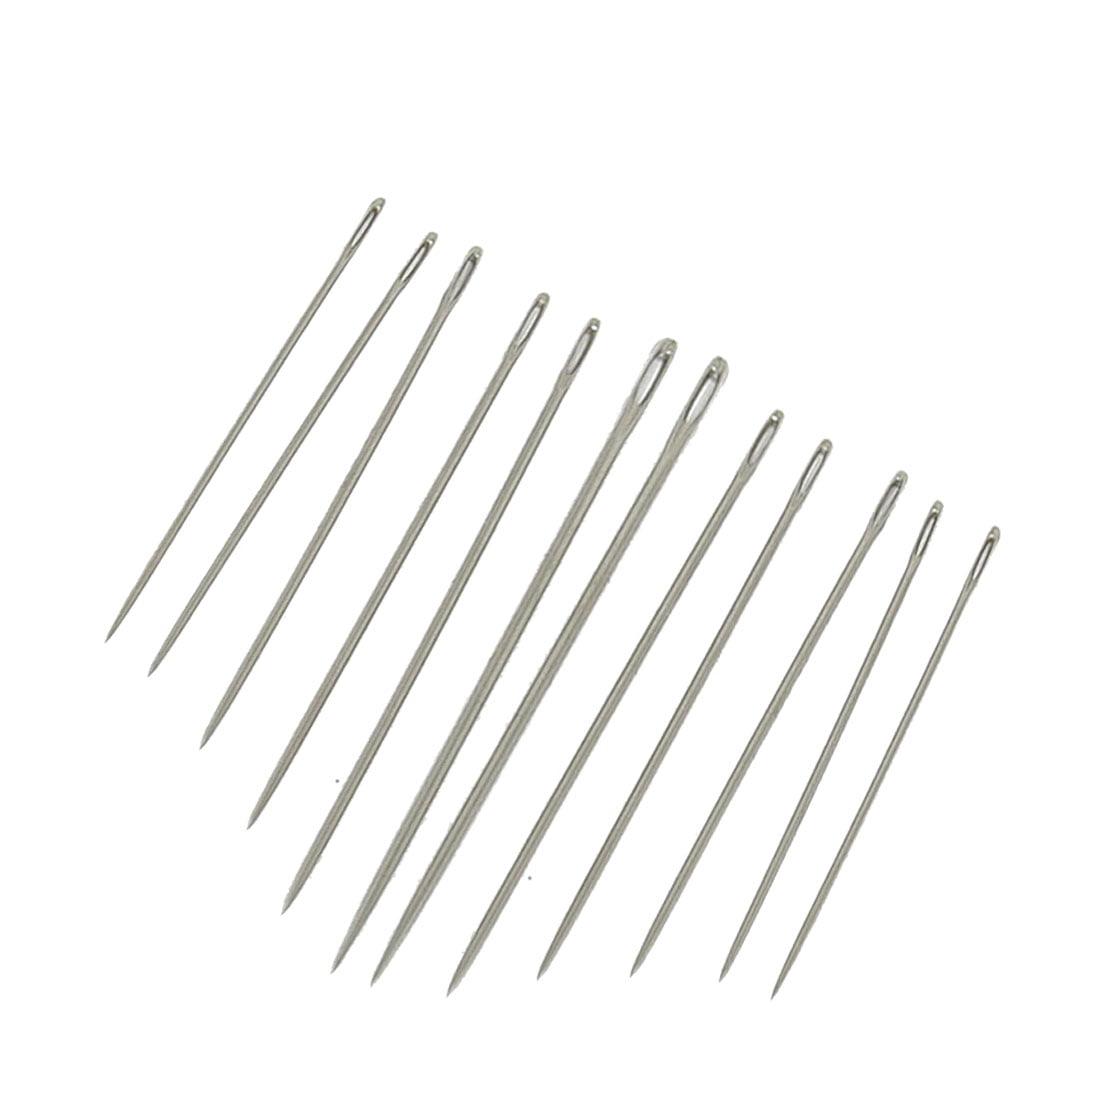 Unique Bargains Handy Tool Metal Sharp Tip Threading Sewing Needles 12 Pcs